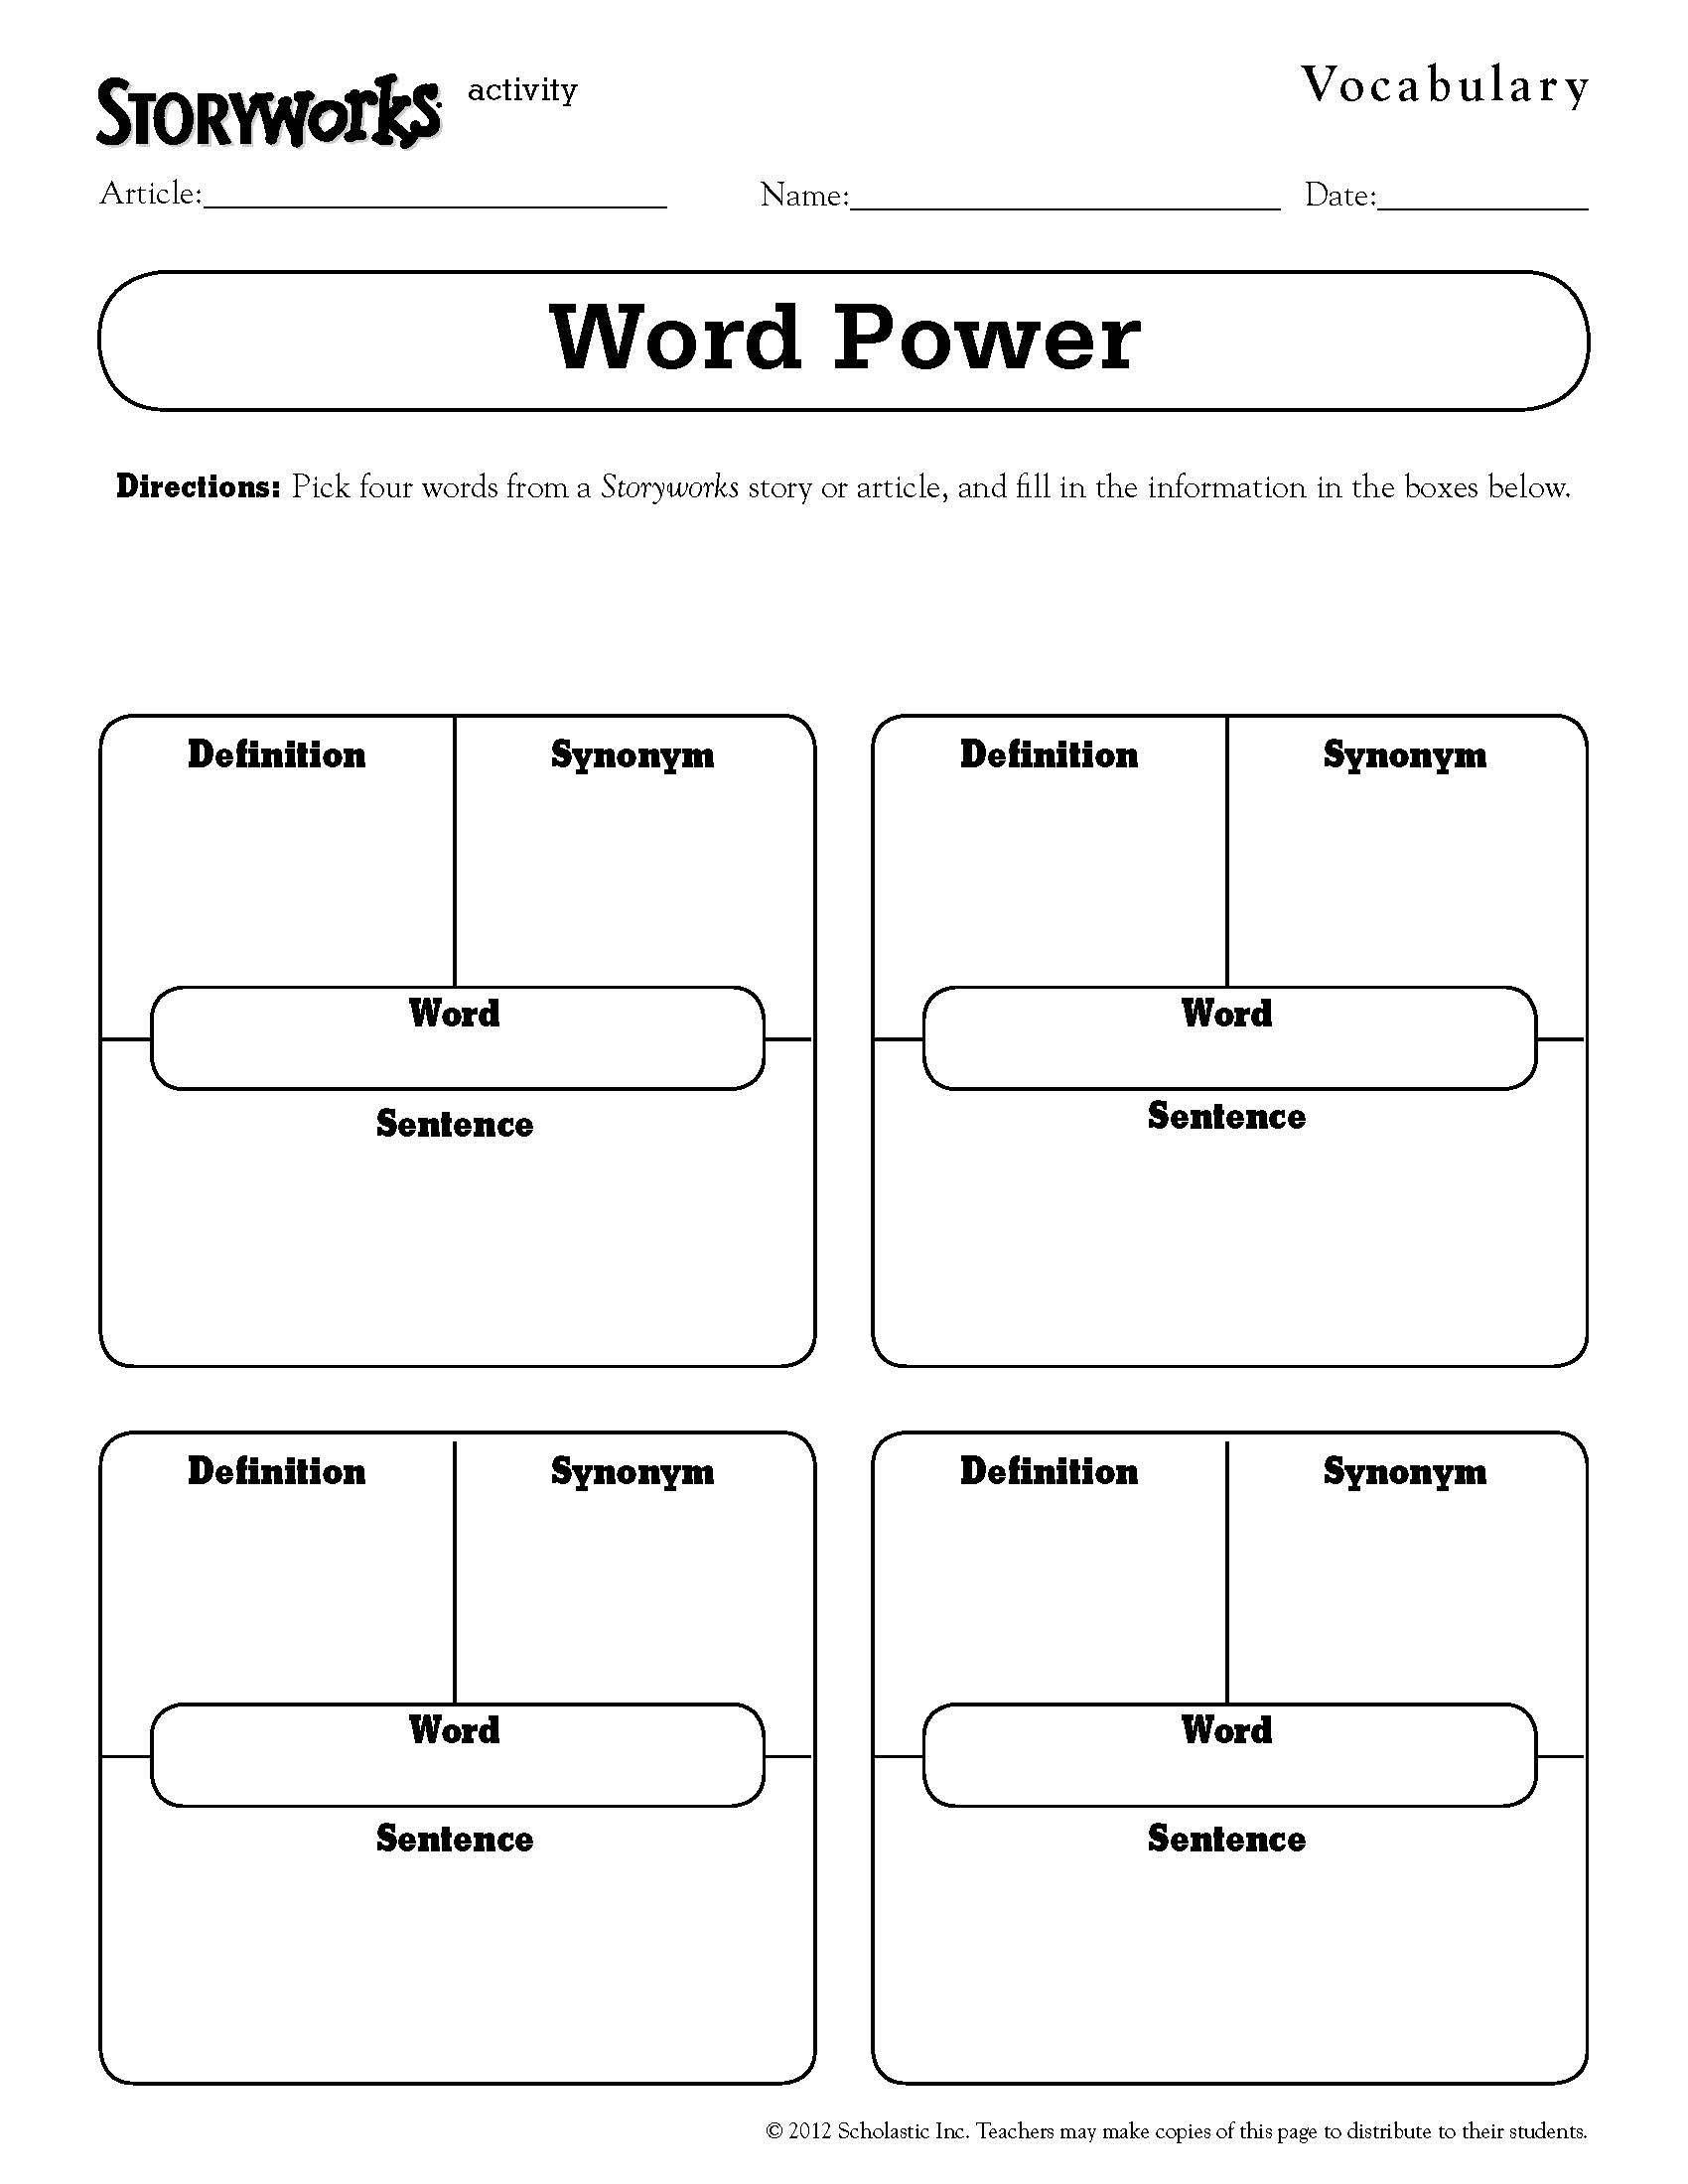 Vocabulary Word Activities